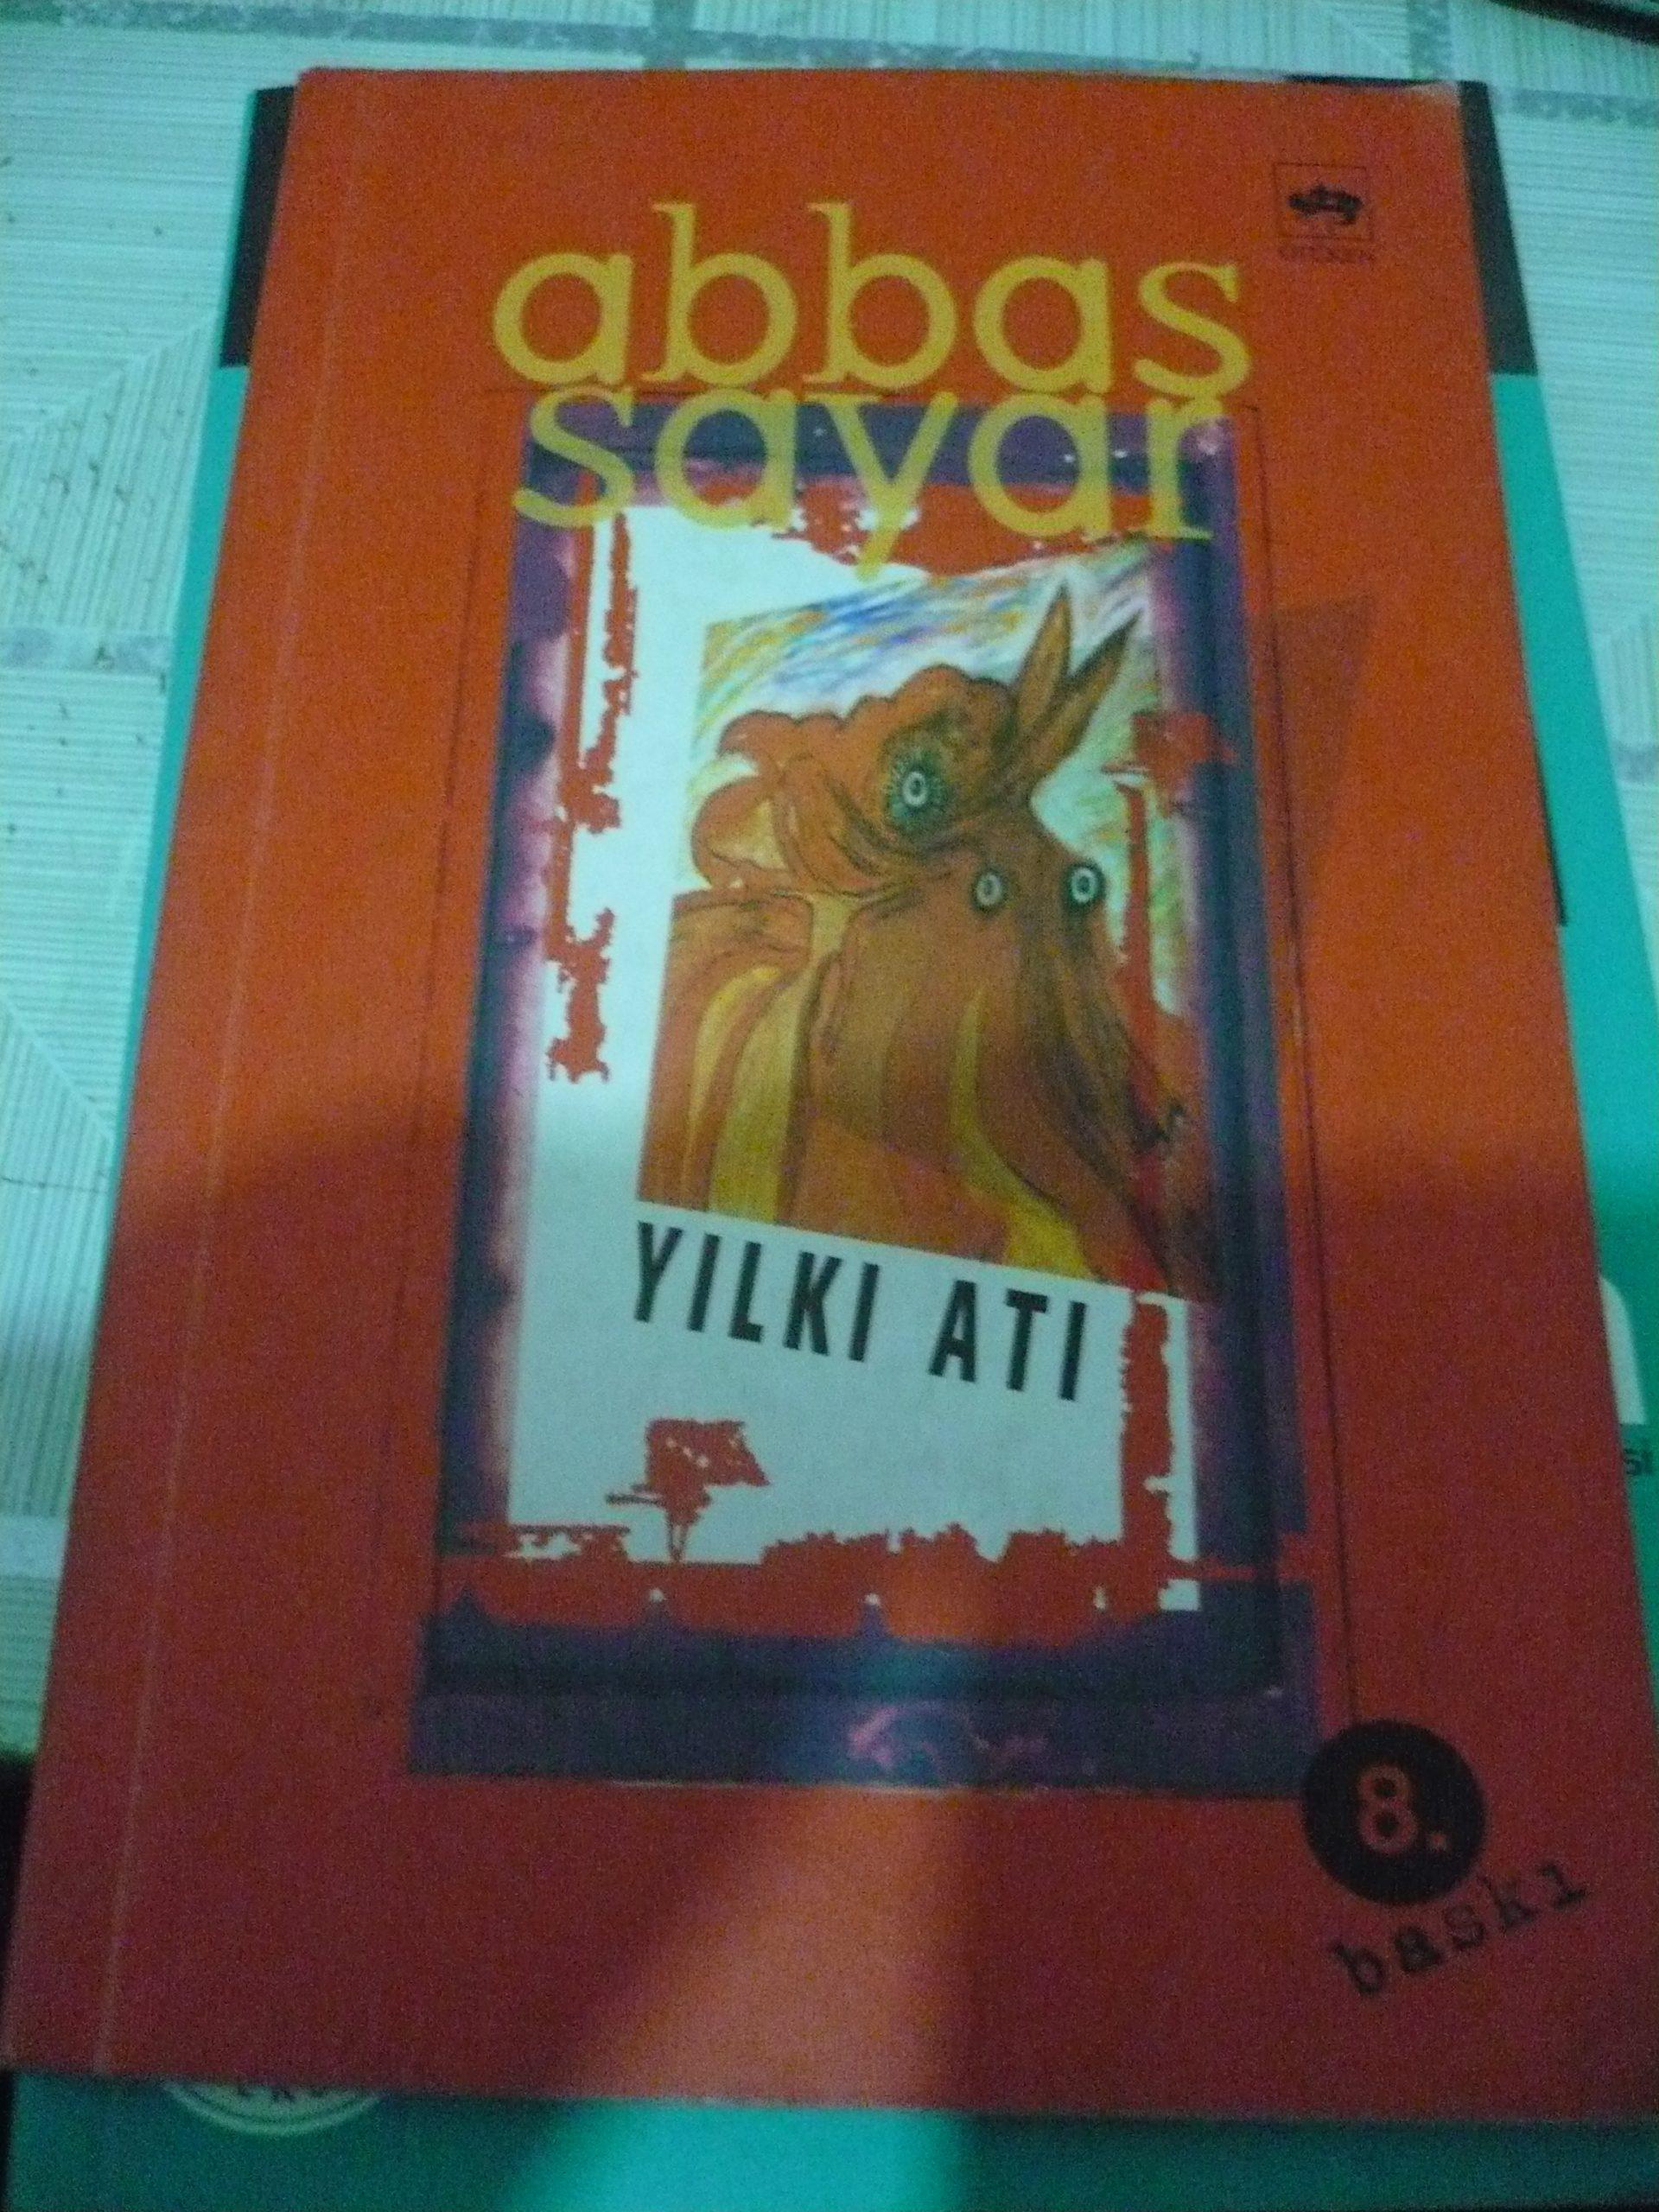 YILKI ATI/ABBAS SAYAR/10 TL